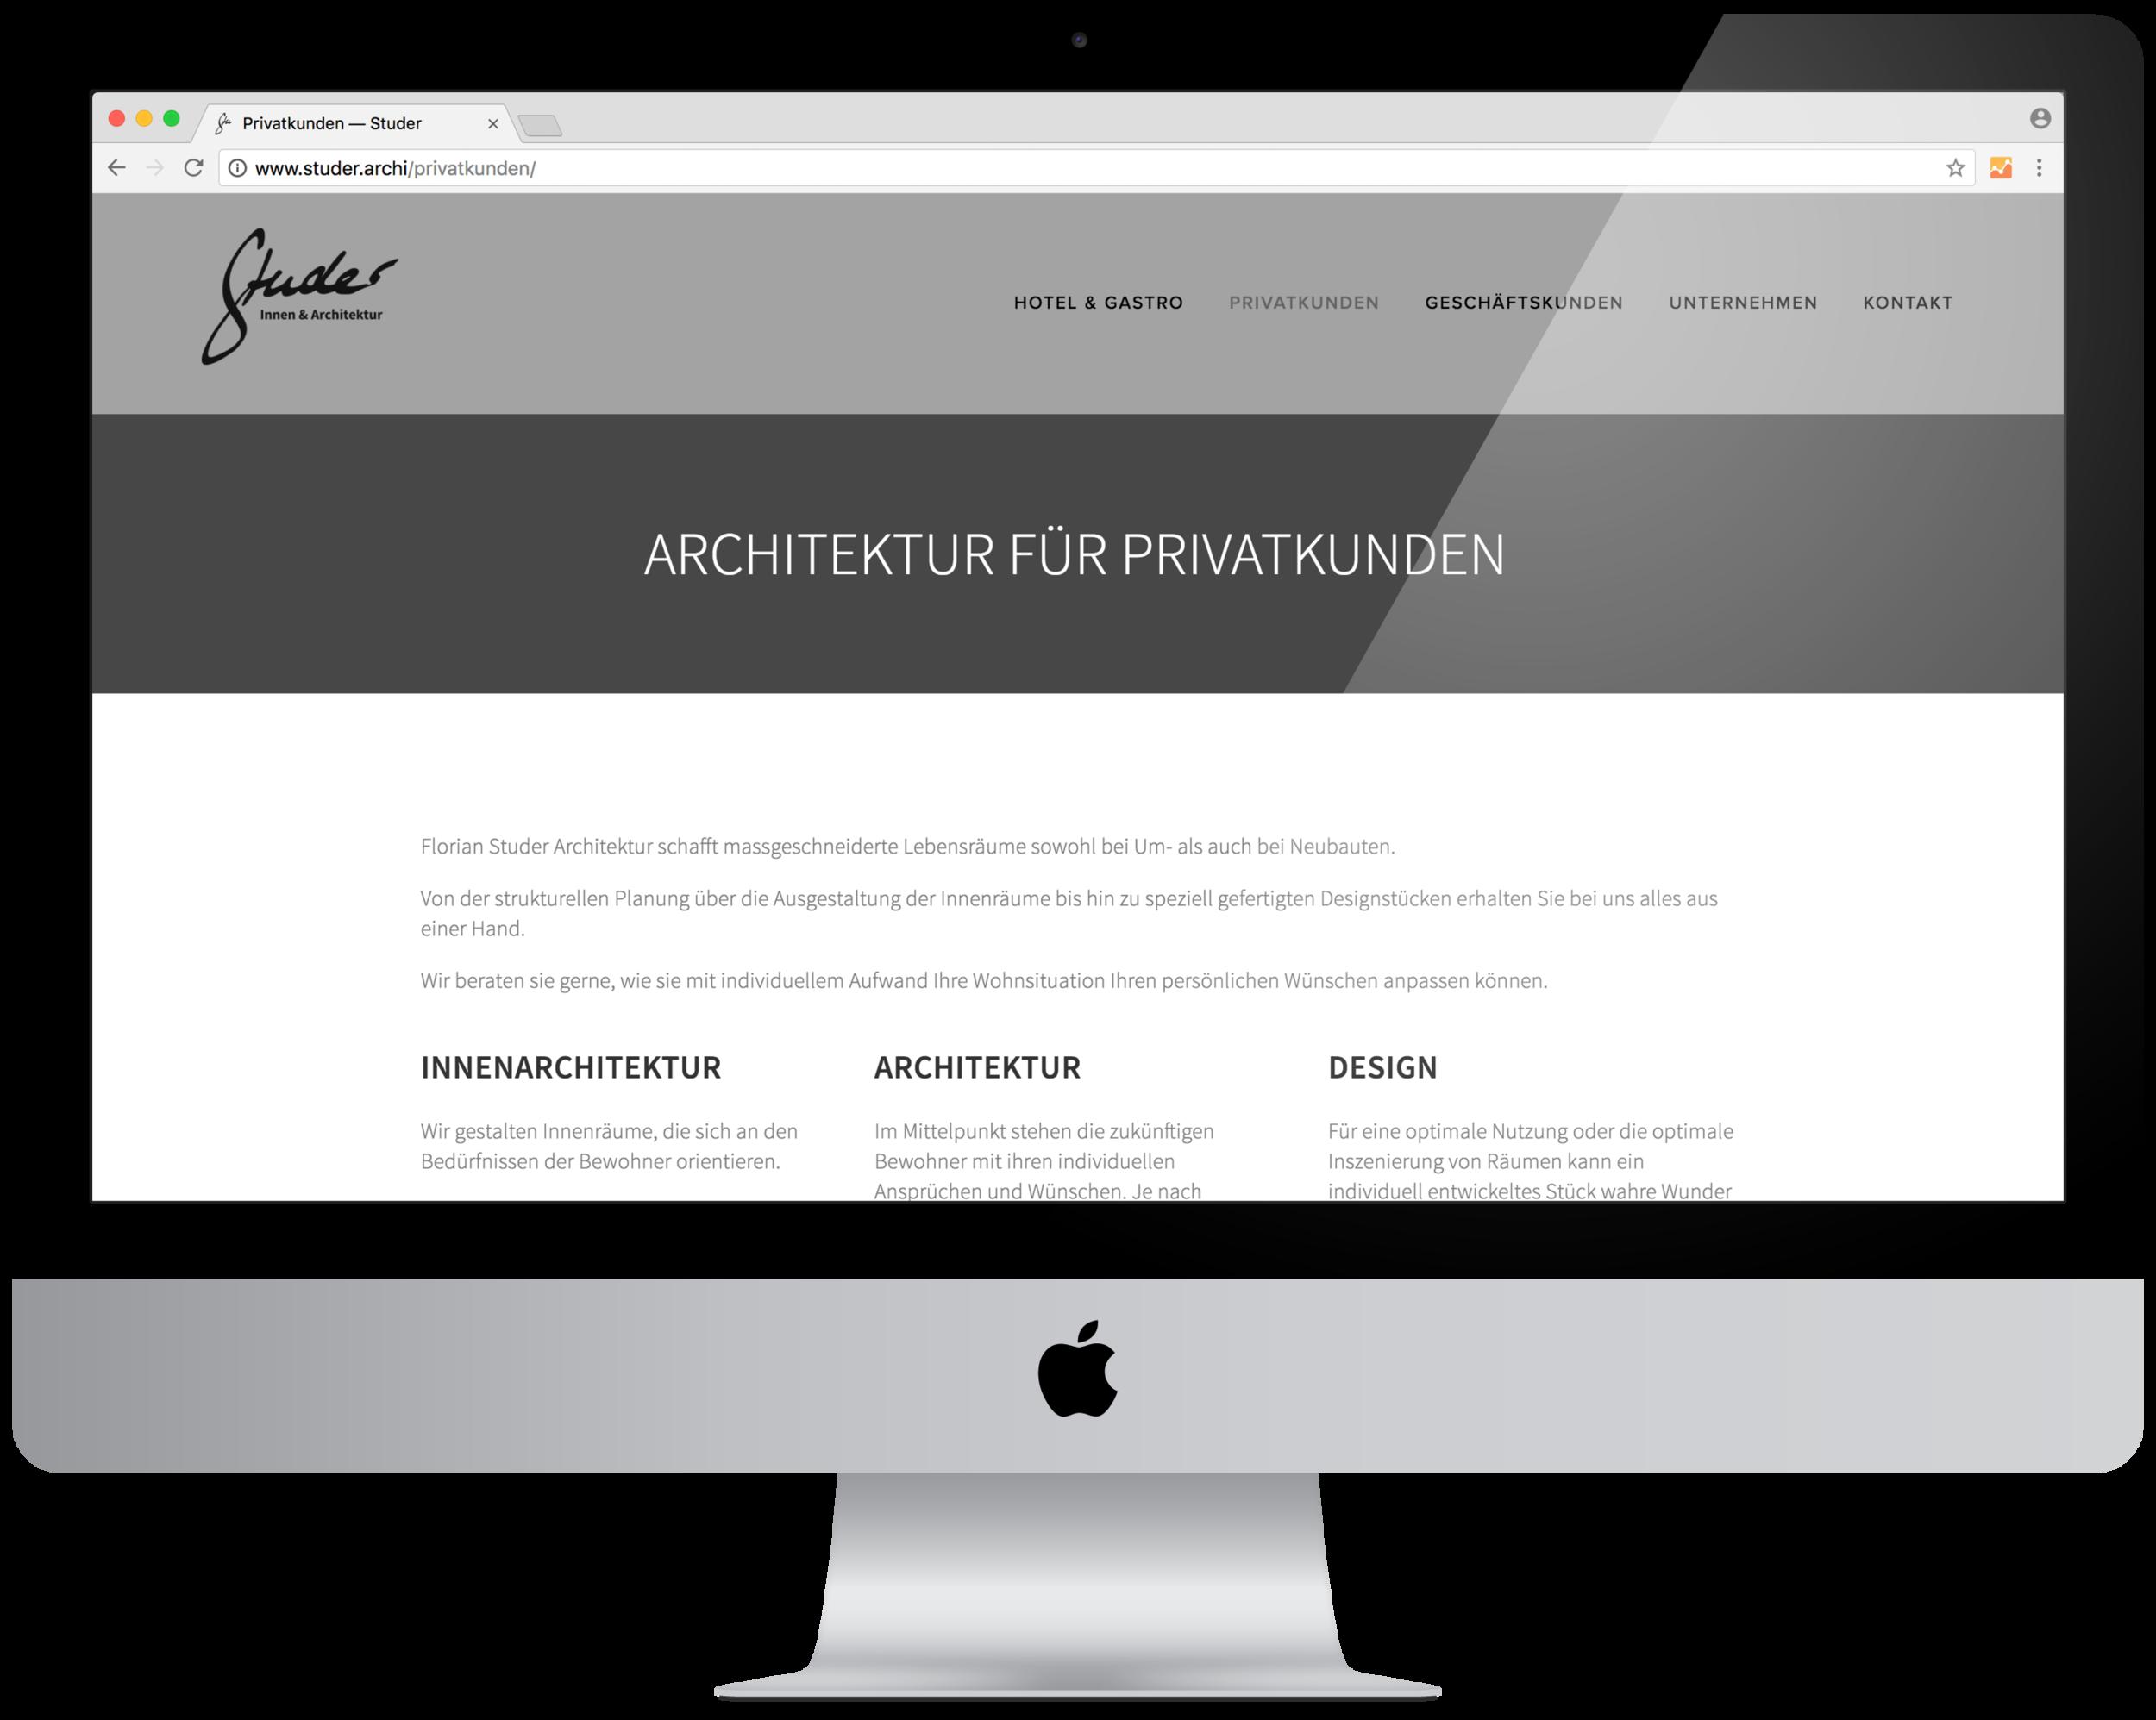 Internet_StuderArchitektur6.png